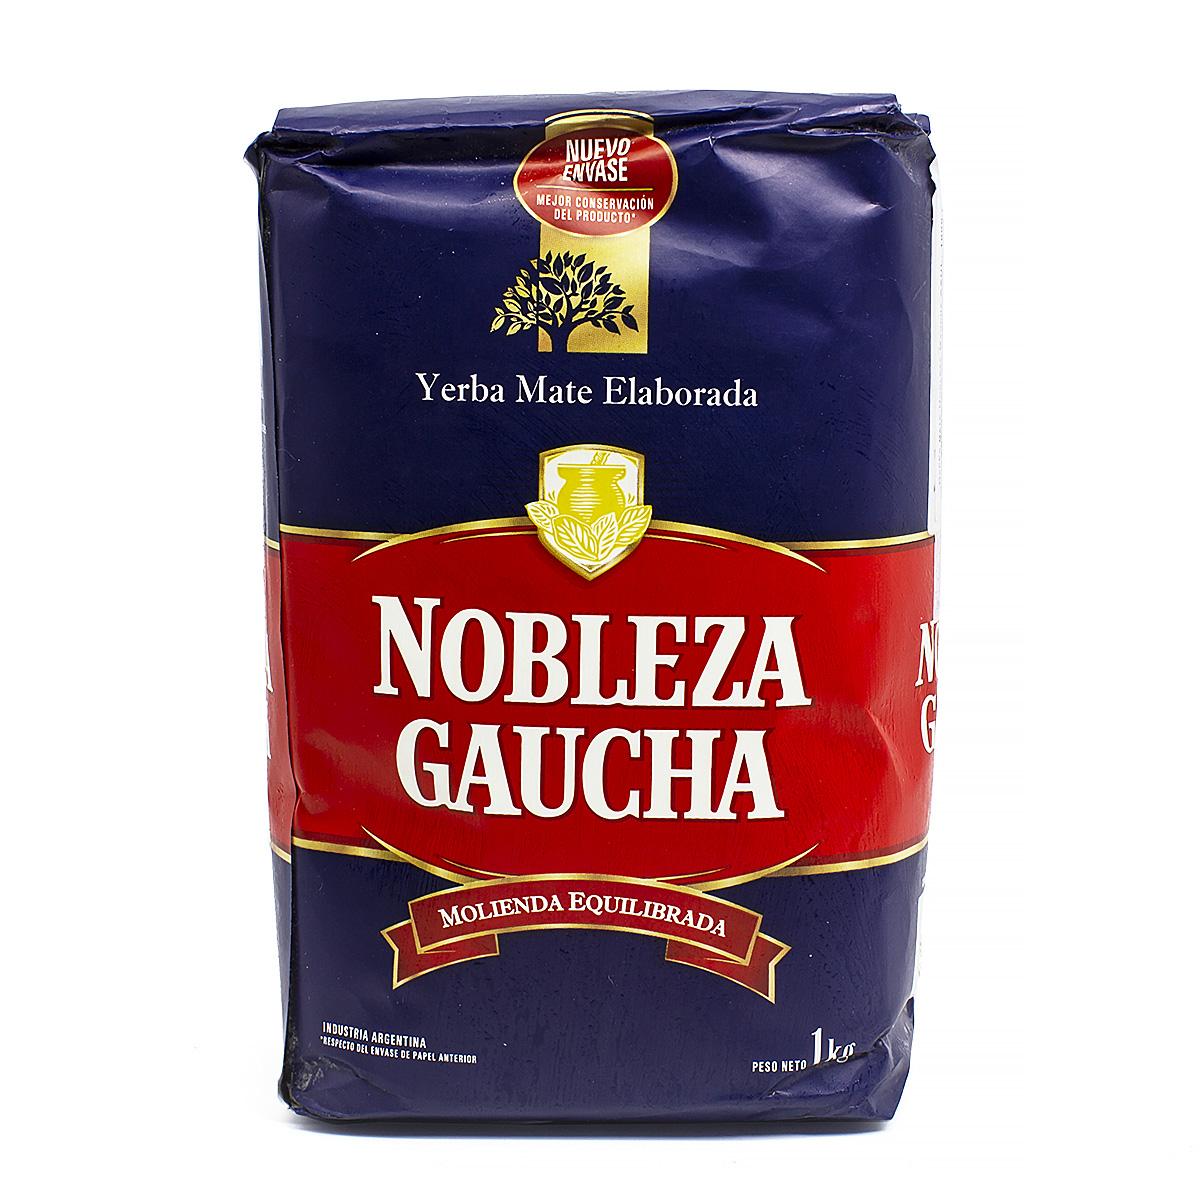 Мате Nobleza Gaucha AZUL, 1000 г мате pipore especial 1000 г